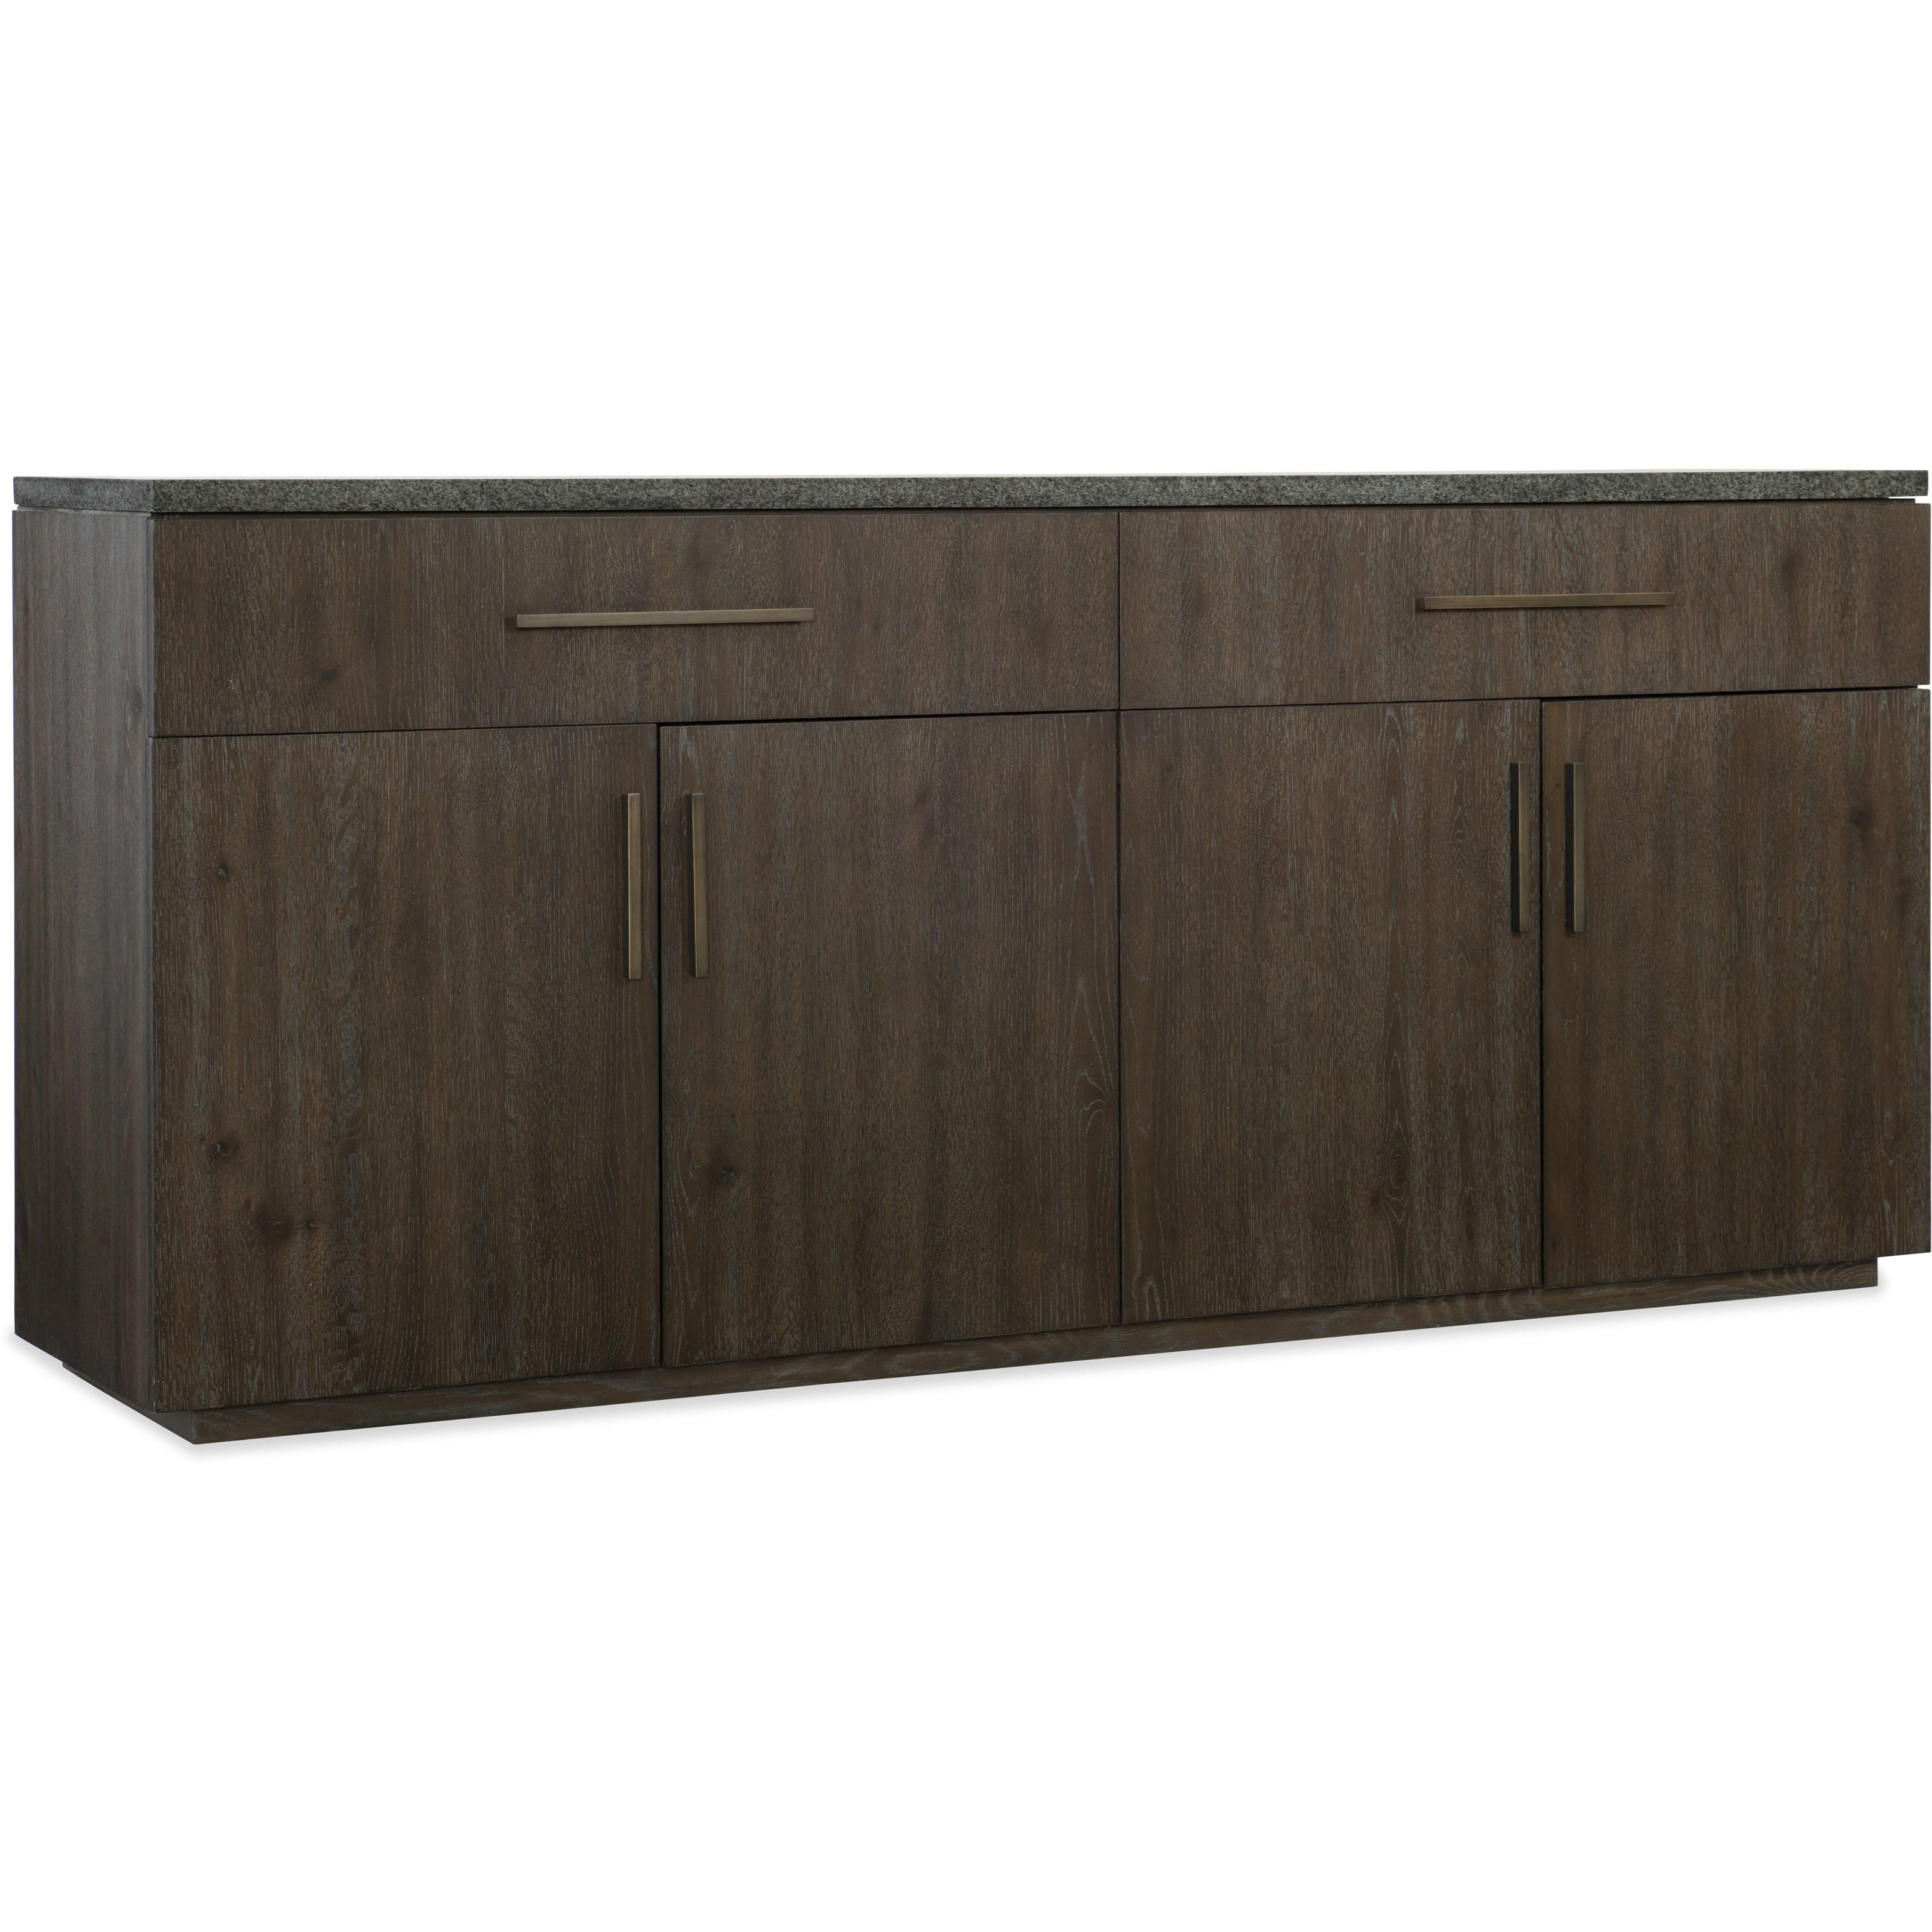 Miramar Aventura Maricopa Buffet by Hooker Furniture at Miller Waldrop Furniture and Decor